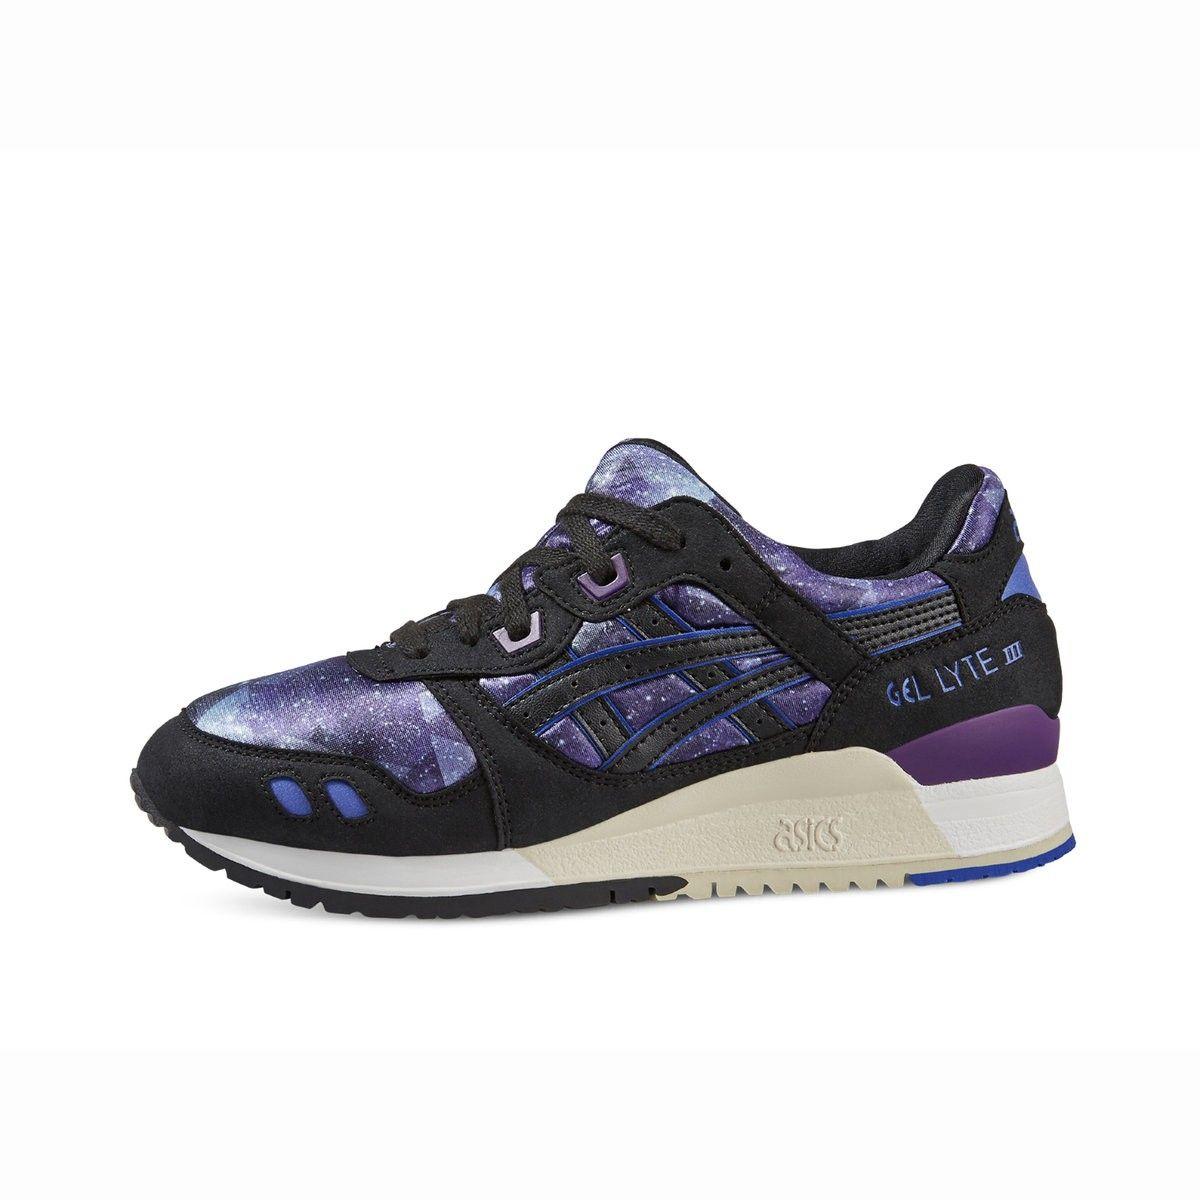 asics gel lyte iii fibra sintetica zapato para correr